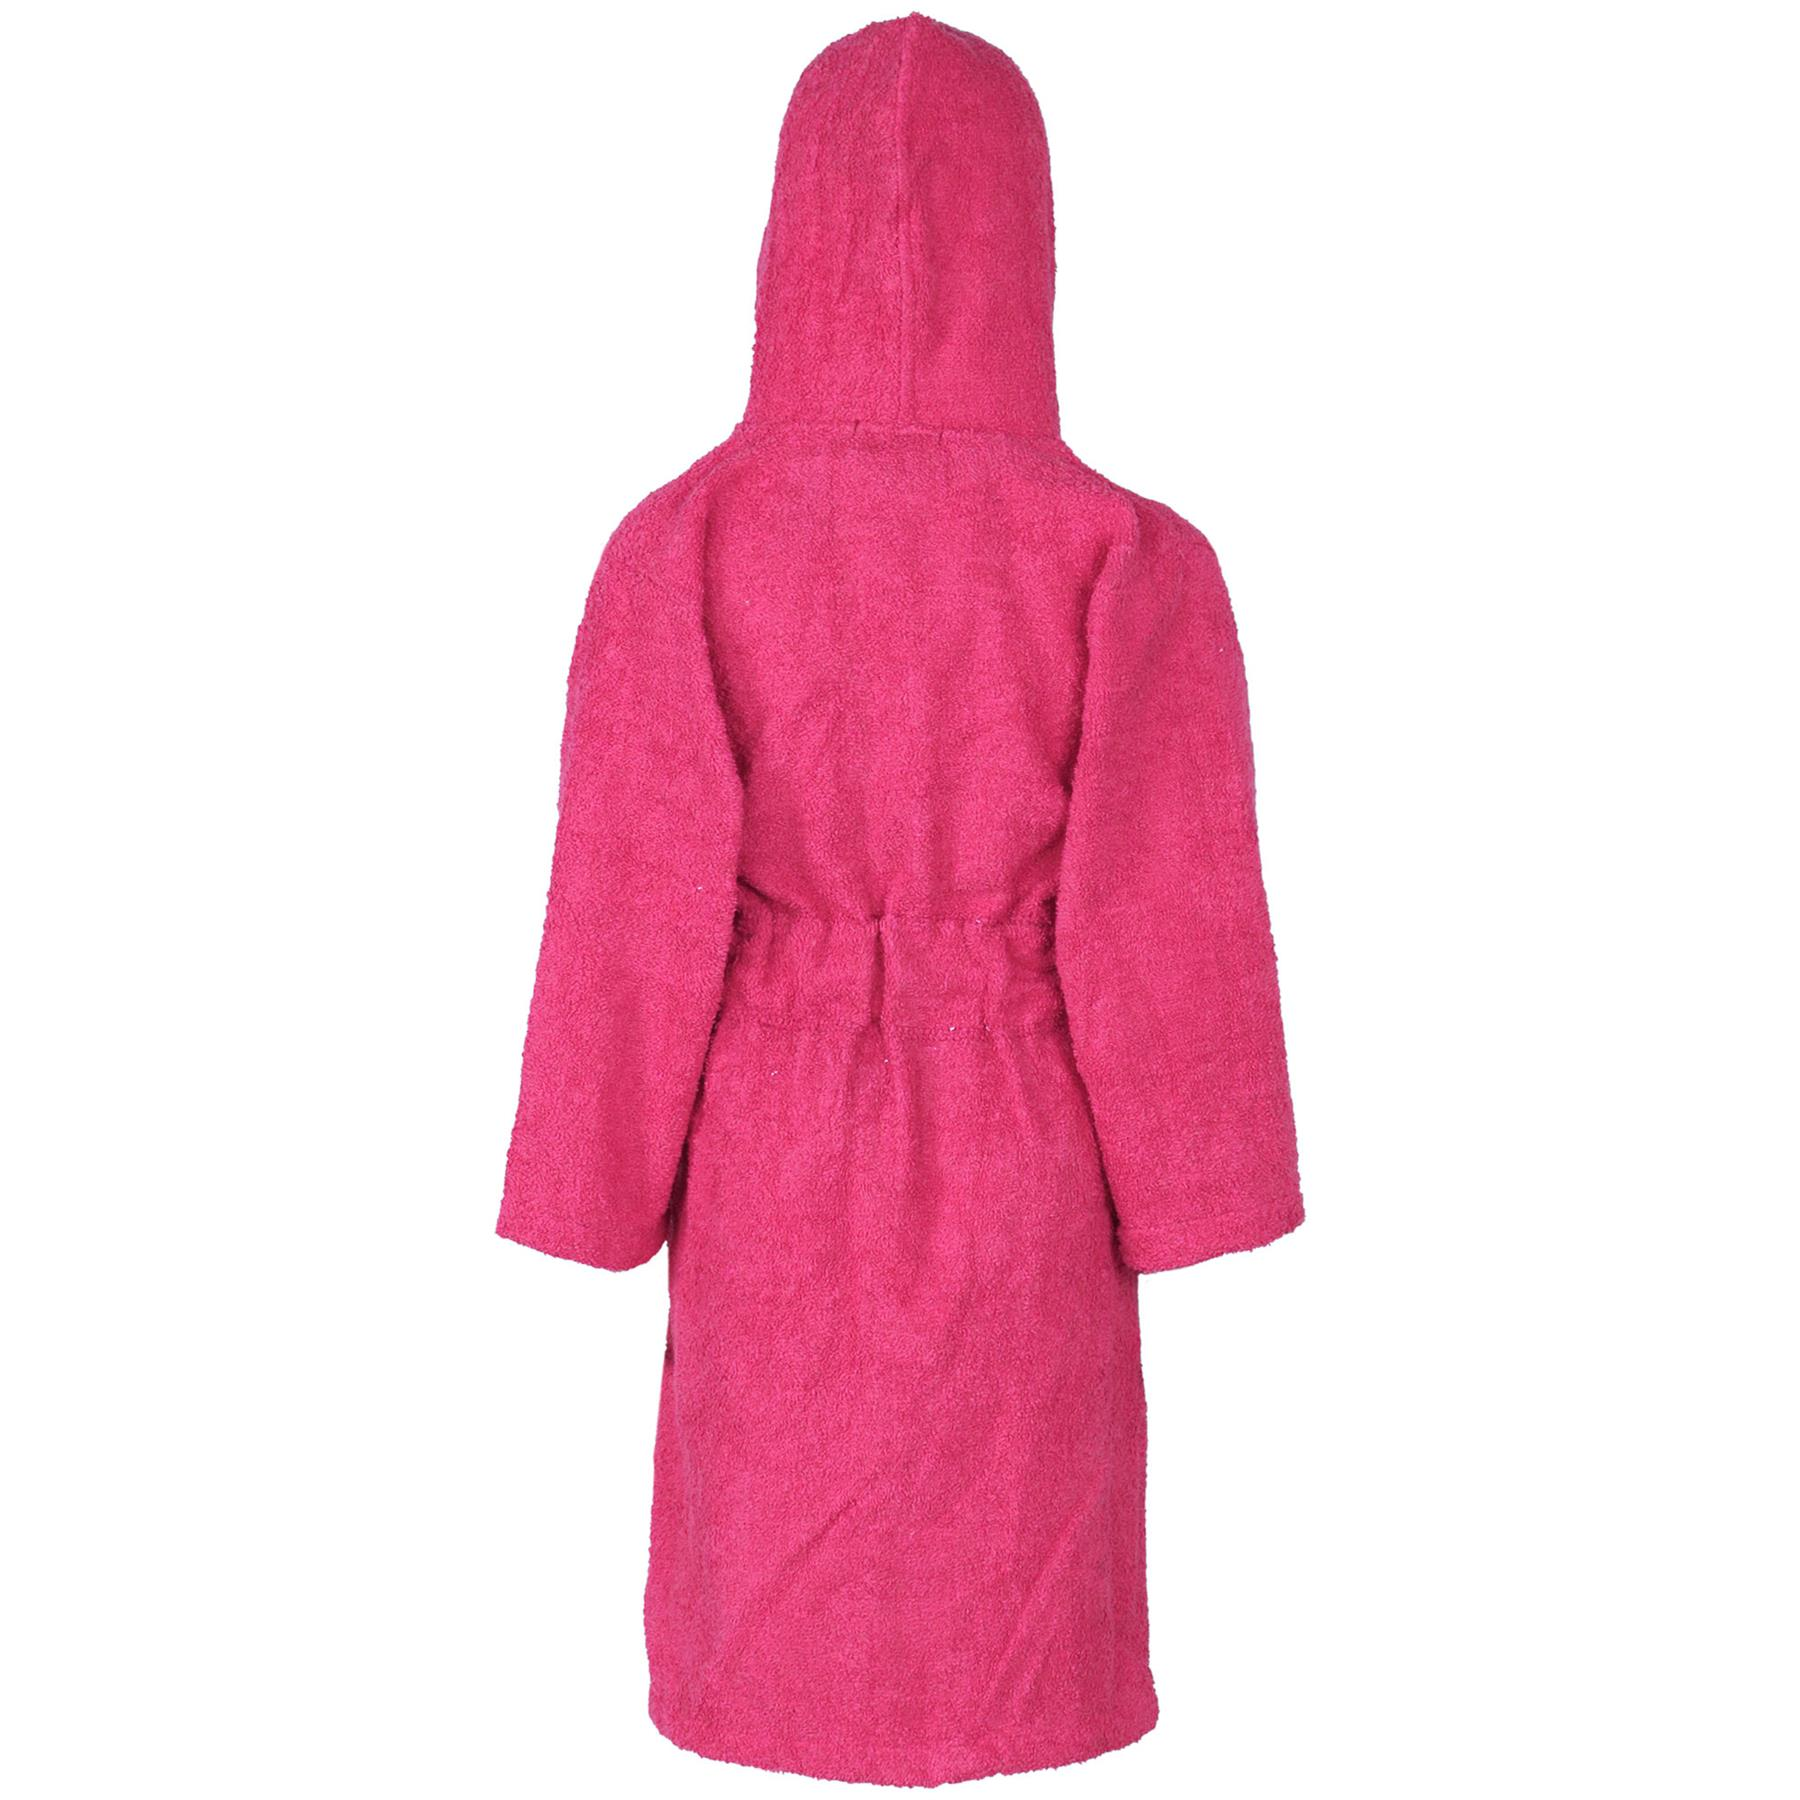 Kids Girls Boys 100/% Cotton Soft Terry Hooded Bathrobe Luxury Dressing Gown 5-13